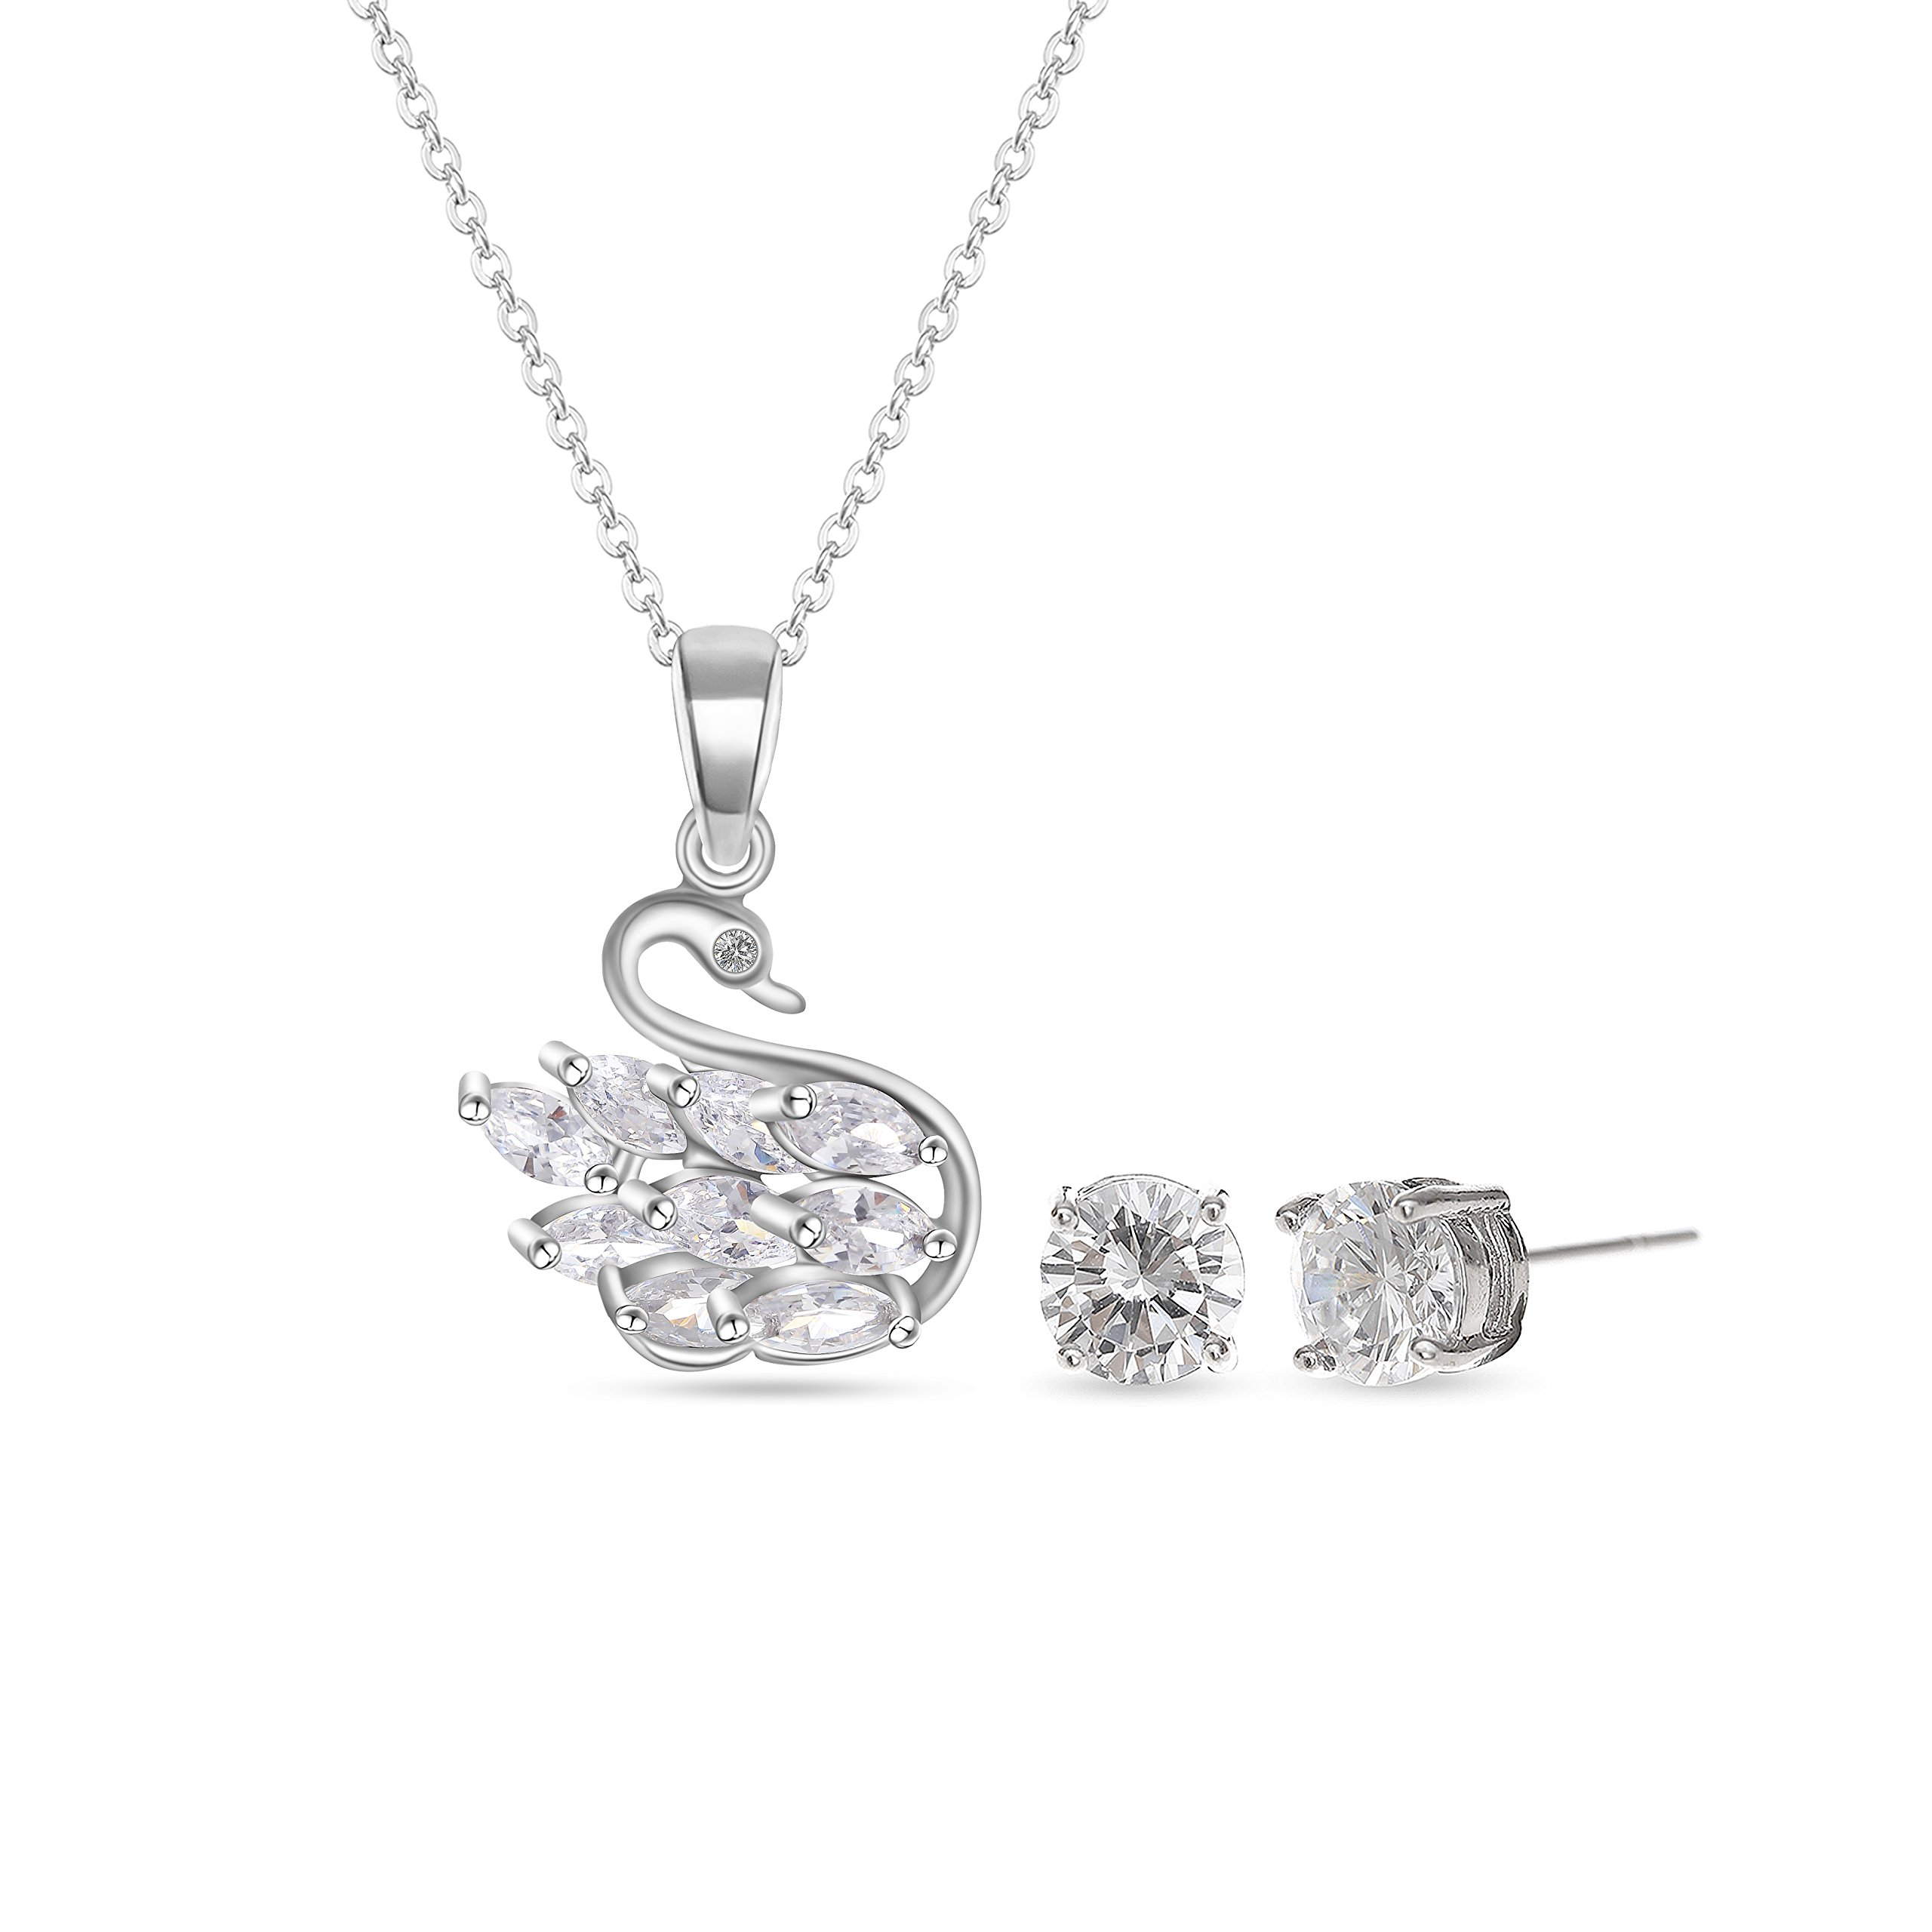 MYKEA Elegant Jewelry Set for Women 925Sterling Silver Swarovski Elements Swan Necklace with Round Diamond Stud Earrings Fashion Jewelry for Valentine's Day,Birthday